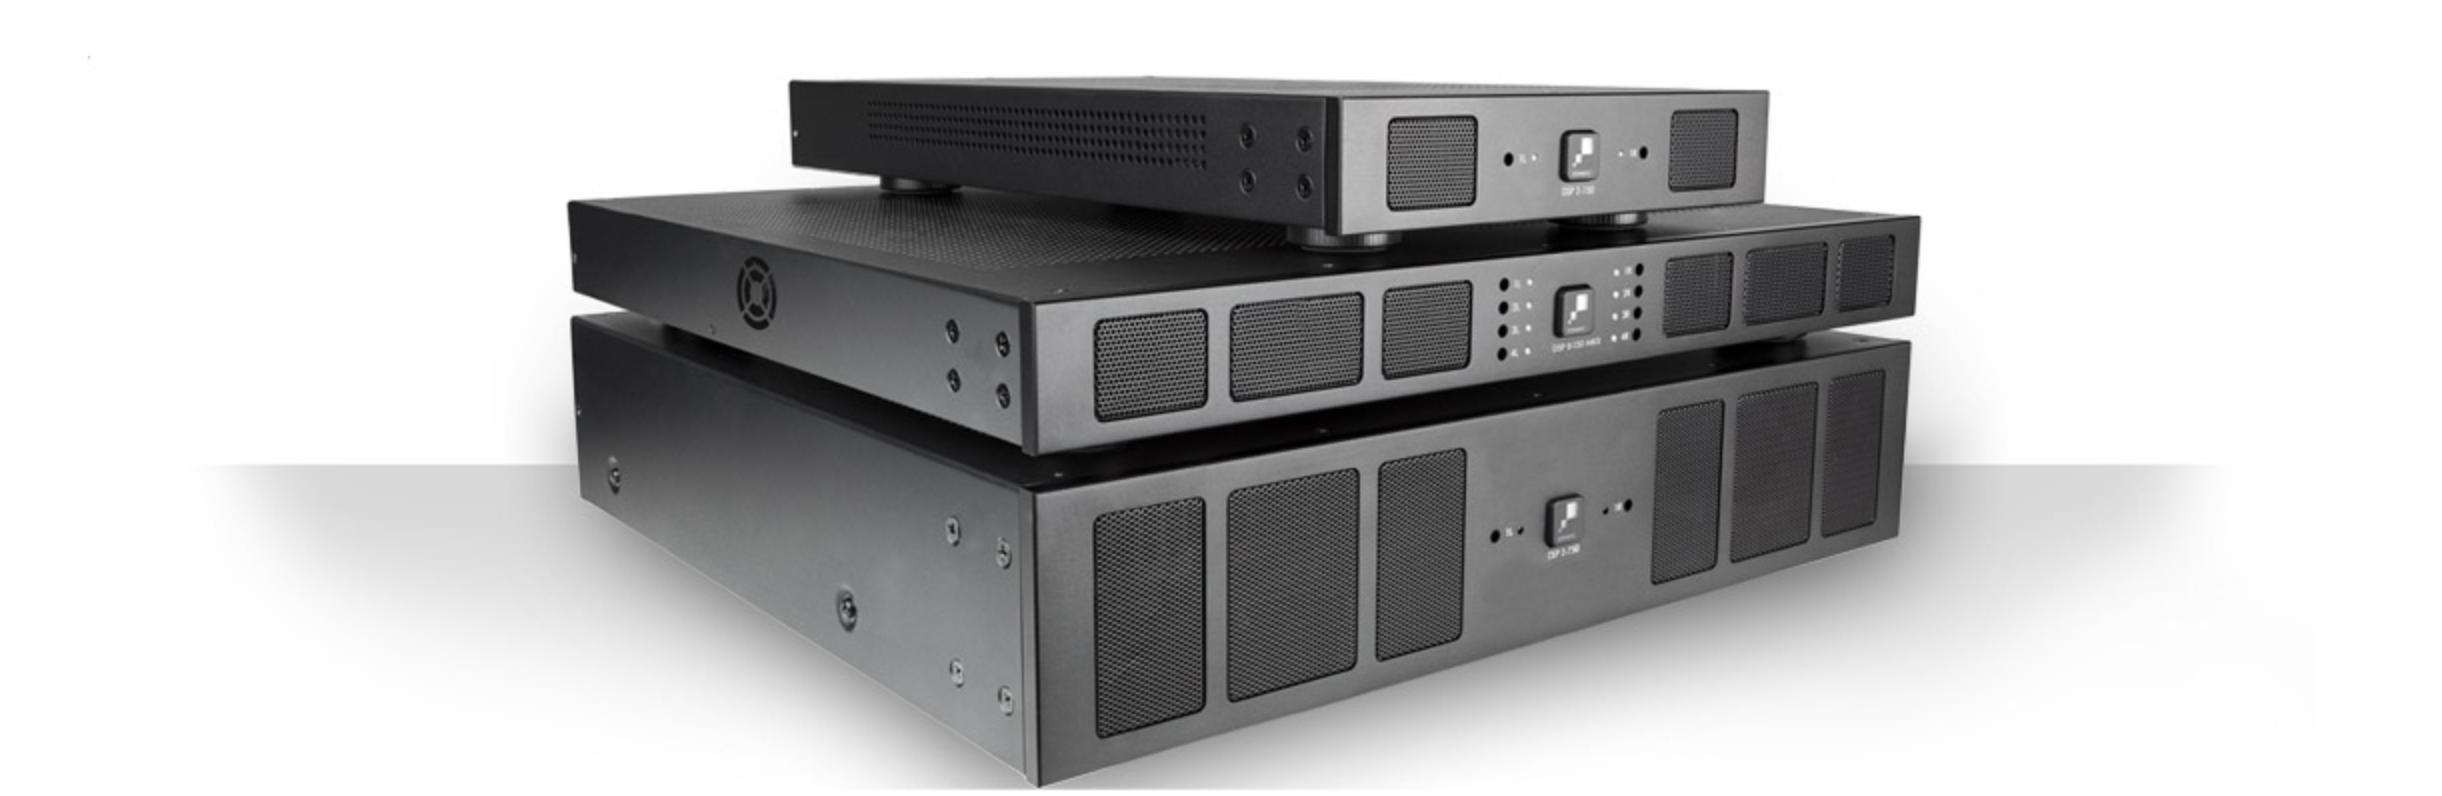 Sonamp DSP Amplifiers